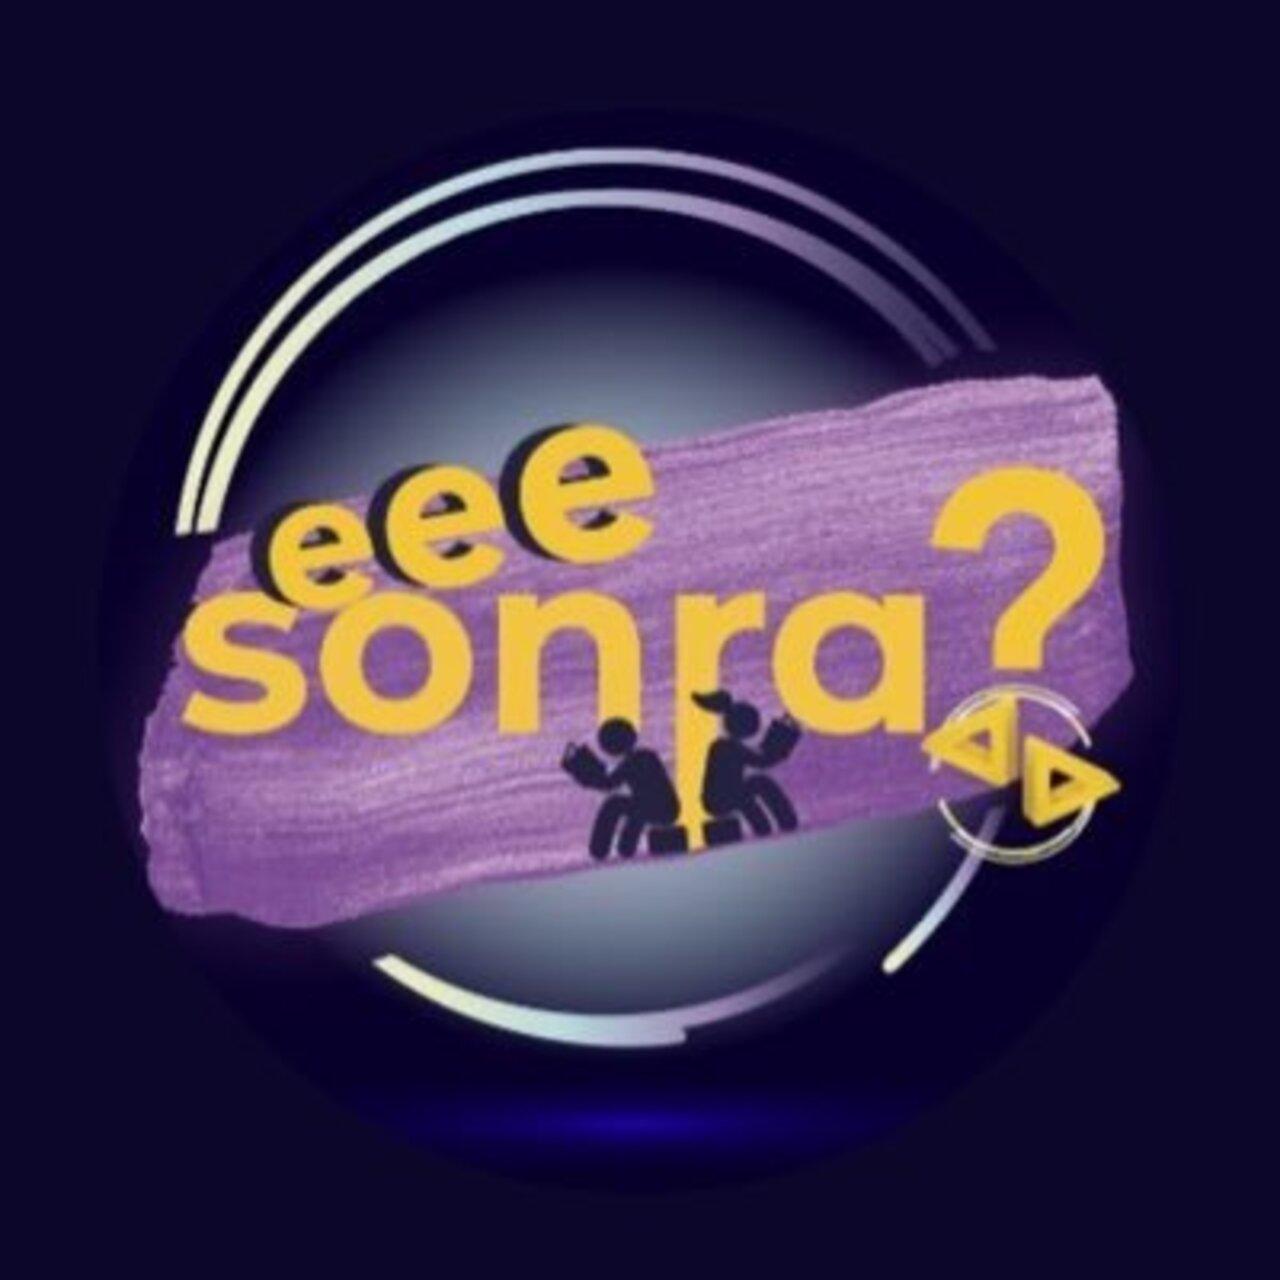 YouTube dizisi Vee Sonra Blu TV'ye transfer oldu!